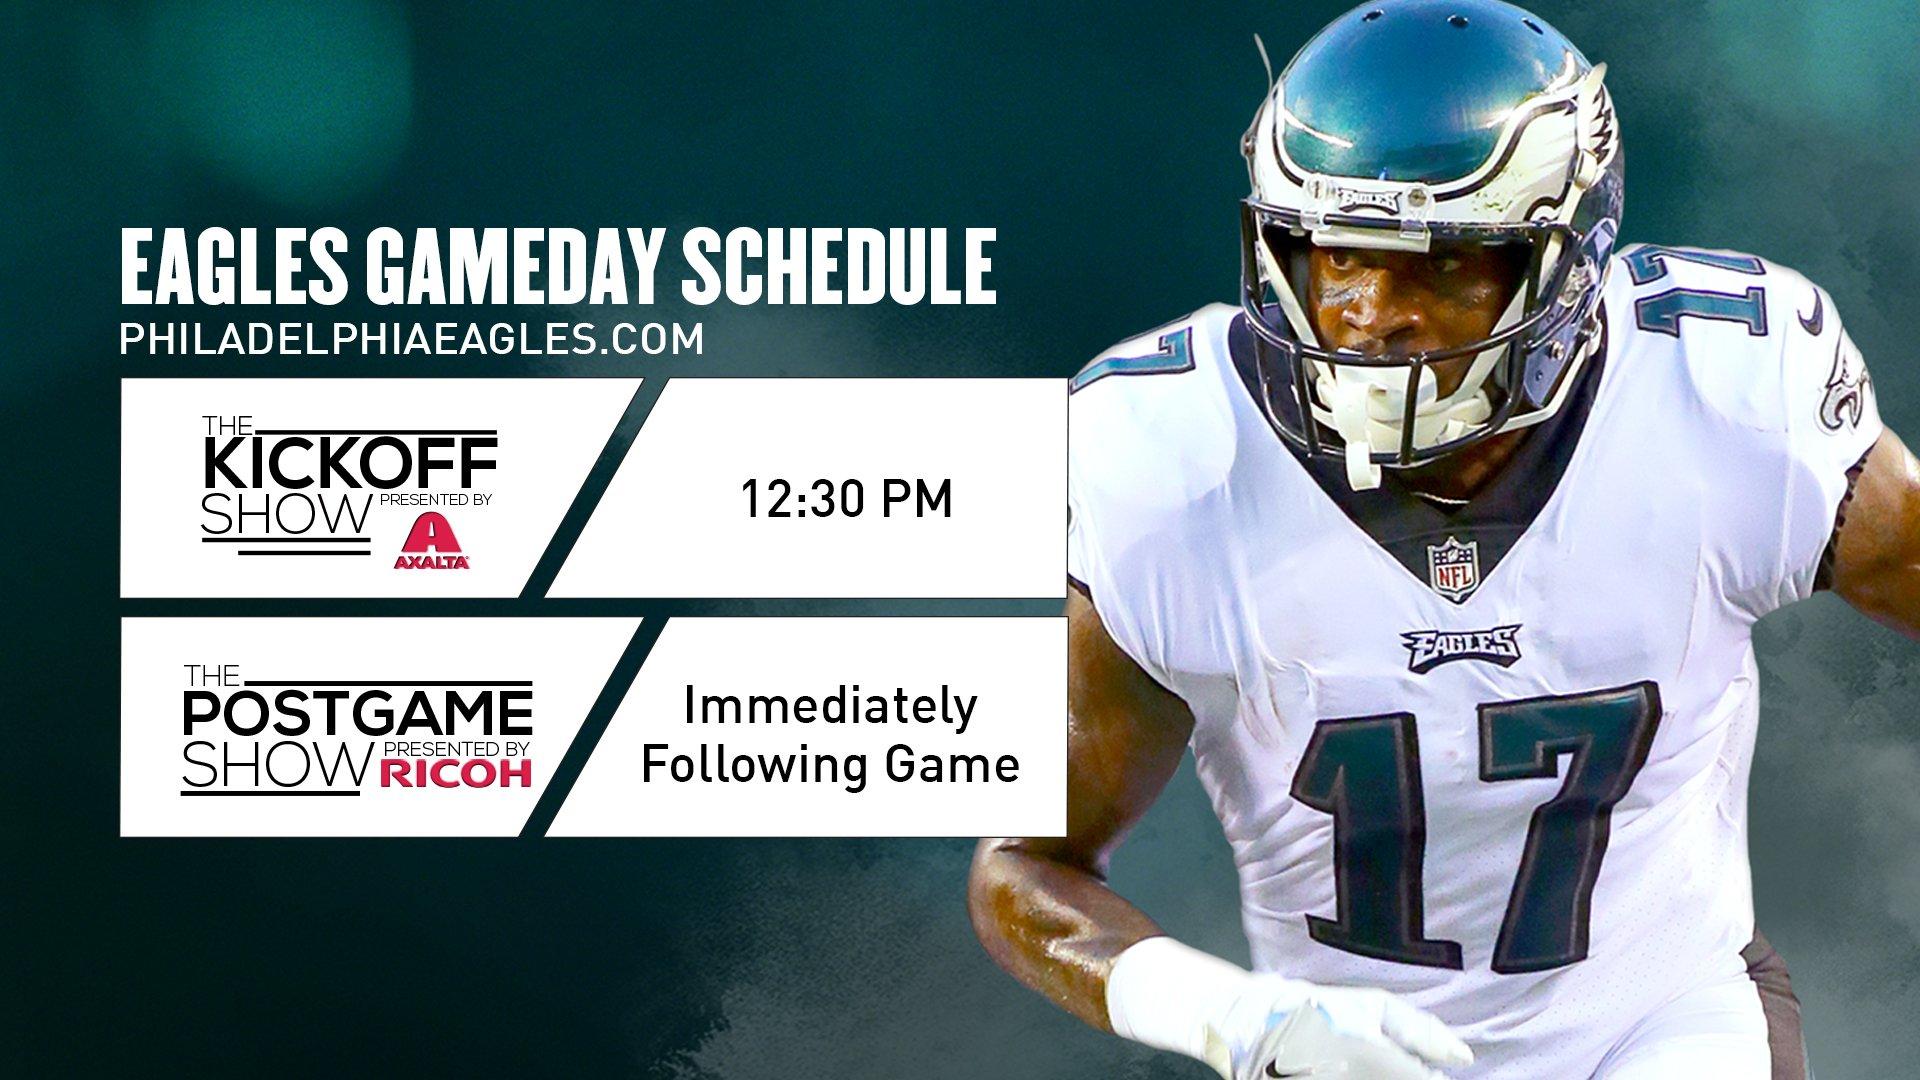 Today's #NYGvsPHI gameday schedule. #FlyEaglesFly https://t.co/fbkYvfaKNK